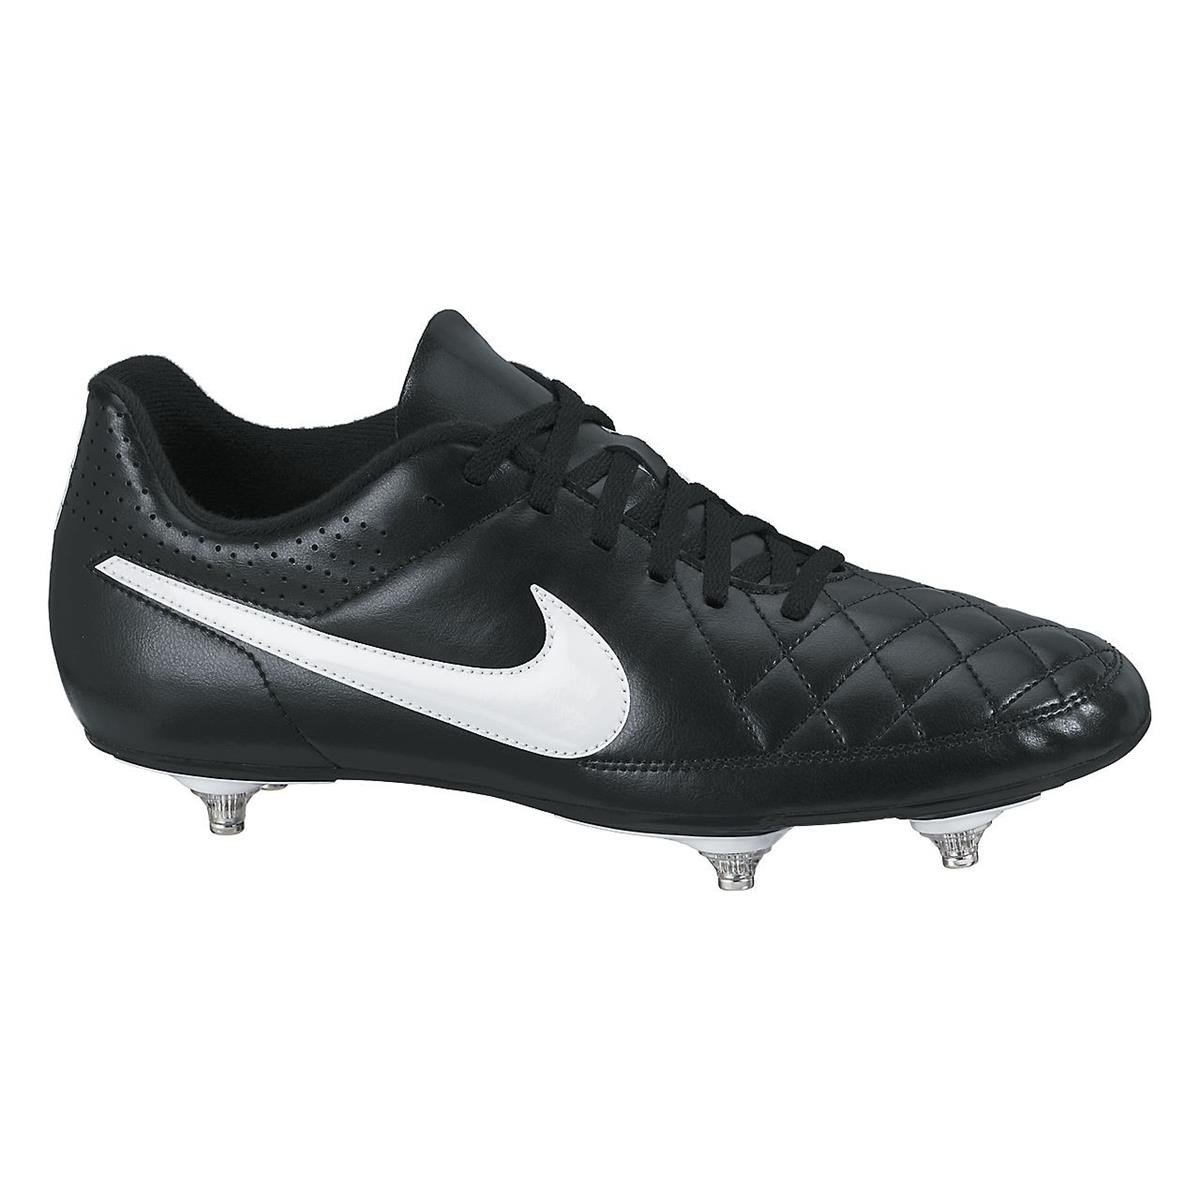 b895dee5753 Nike teempo Rio II SG Mens Football Boots 631288 Soccer Cleats (UK 7 US 8  EU 41